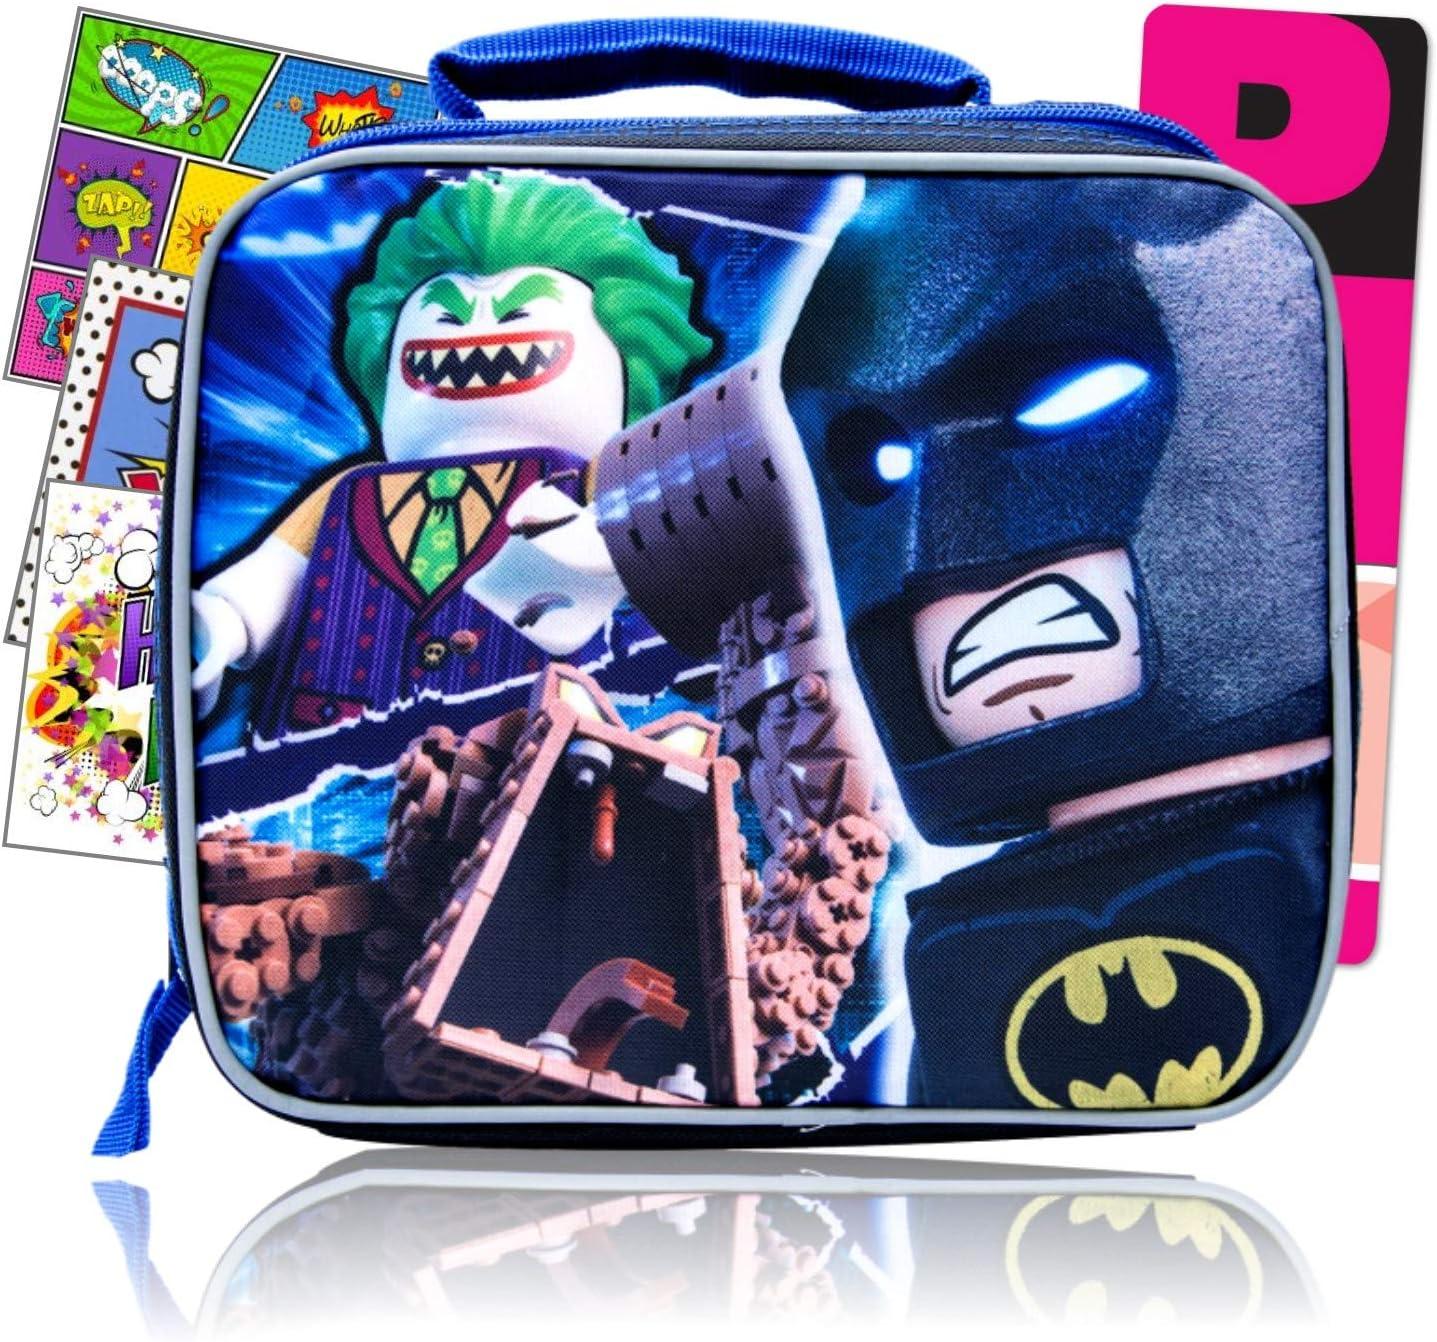 Lego Batman Kids Lunch Box Bundled with Specialty Separately Licensed GWW Reward Stickers & Bookmark